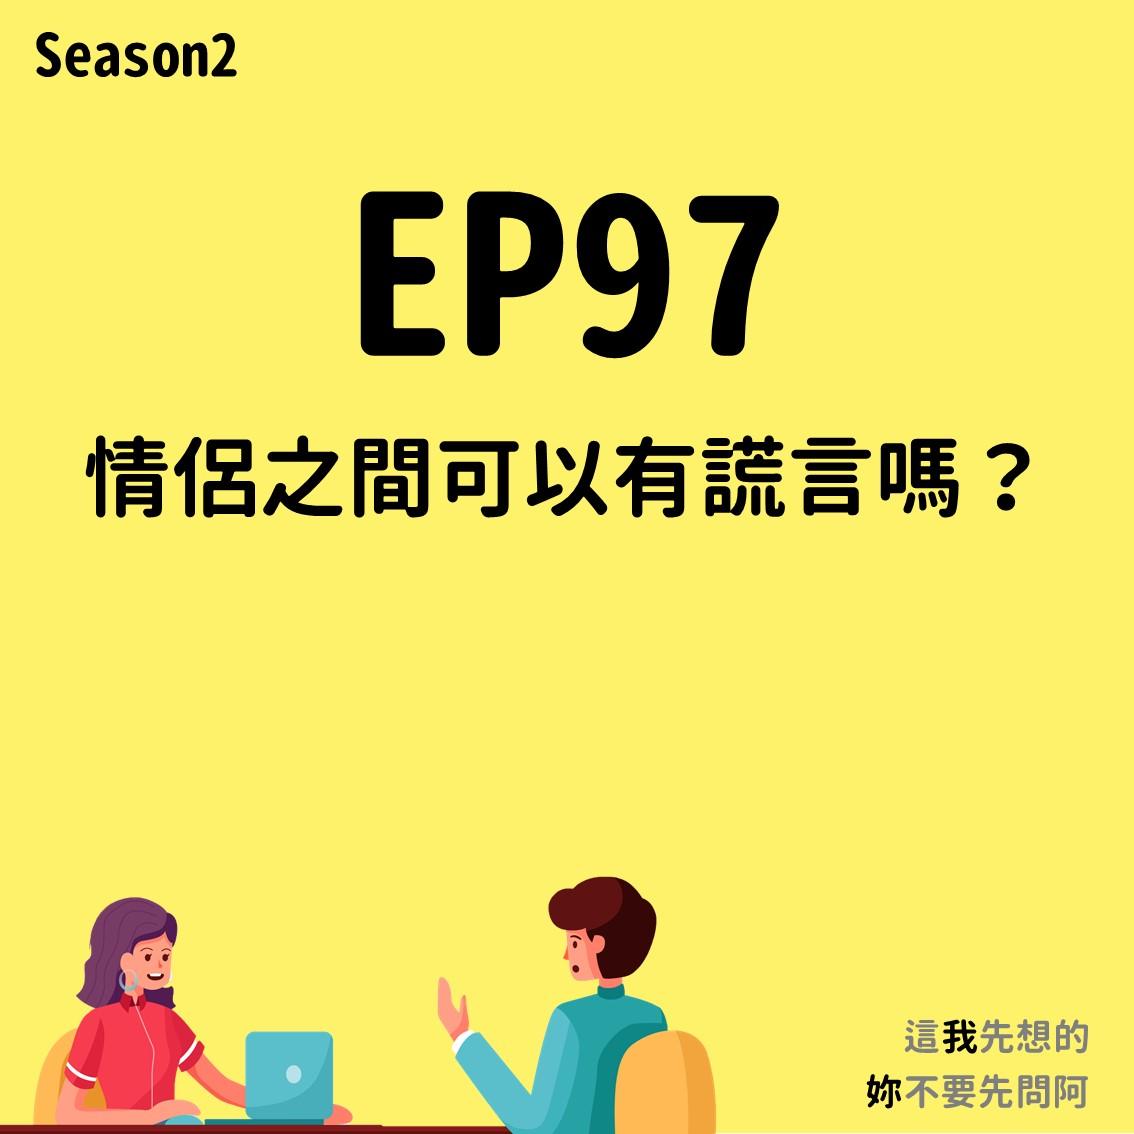 EP97 情侶之間可以有謊言嗎?